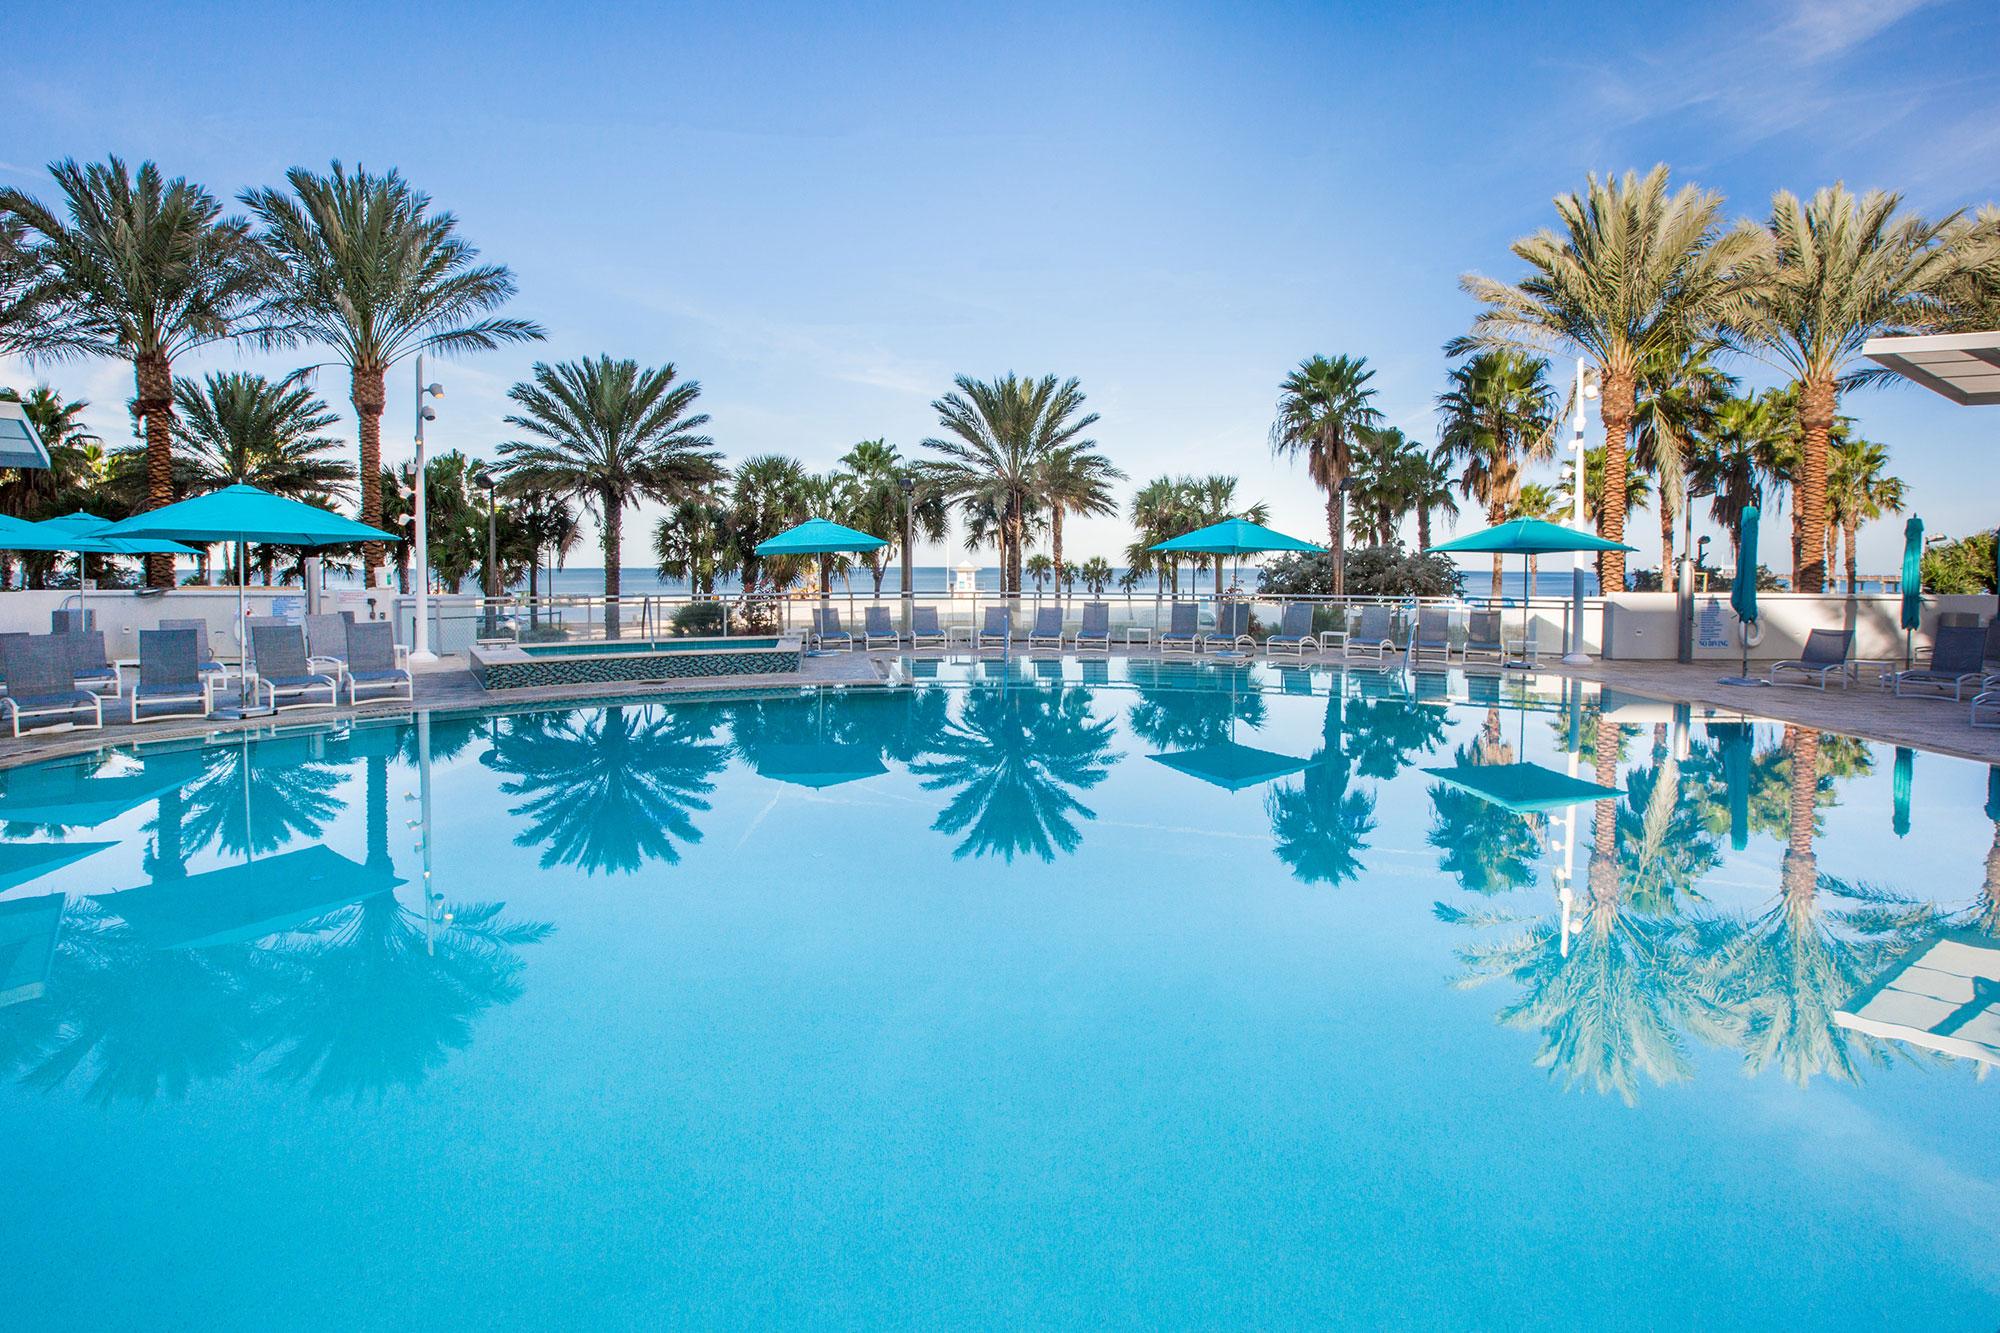 Apartment Clearwater Beach Resort 2 Bedrooms 2 bathrooms photo 20363966